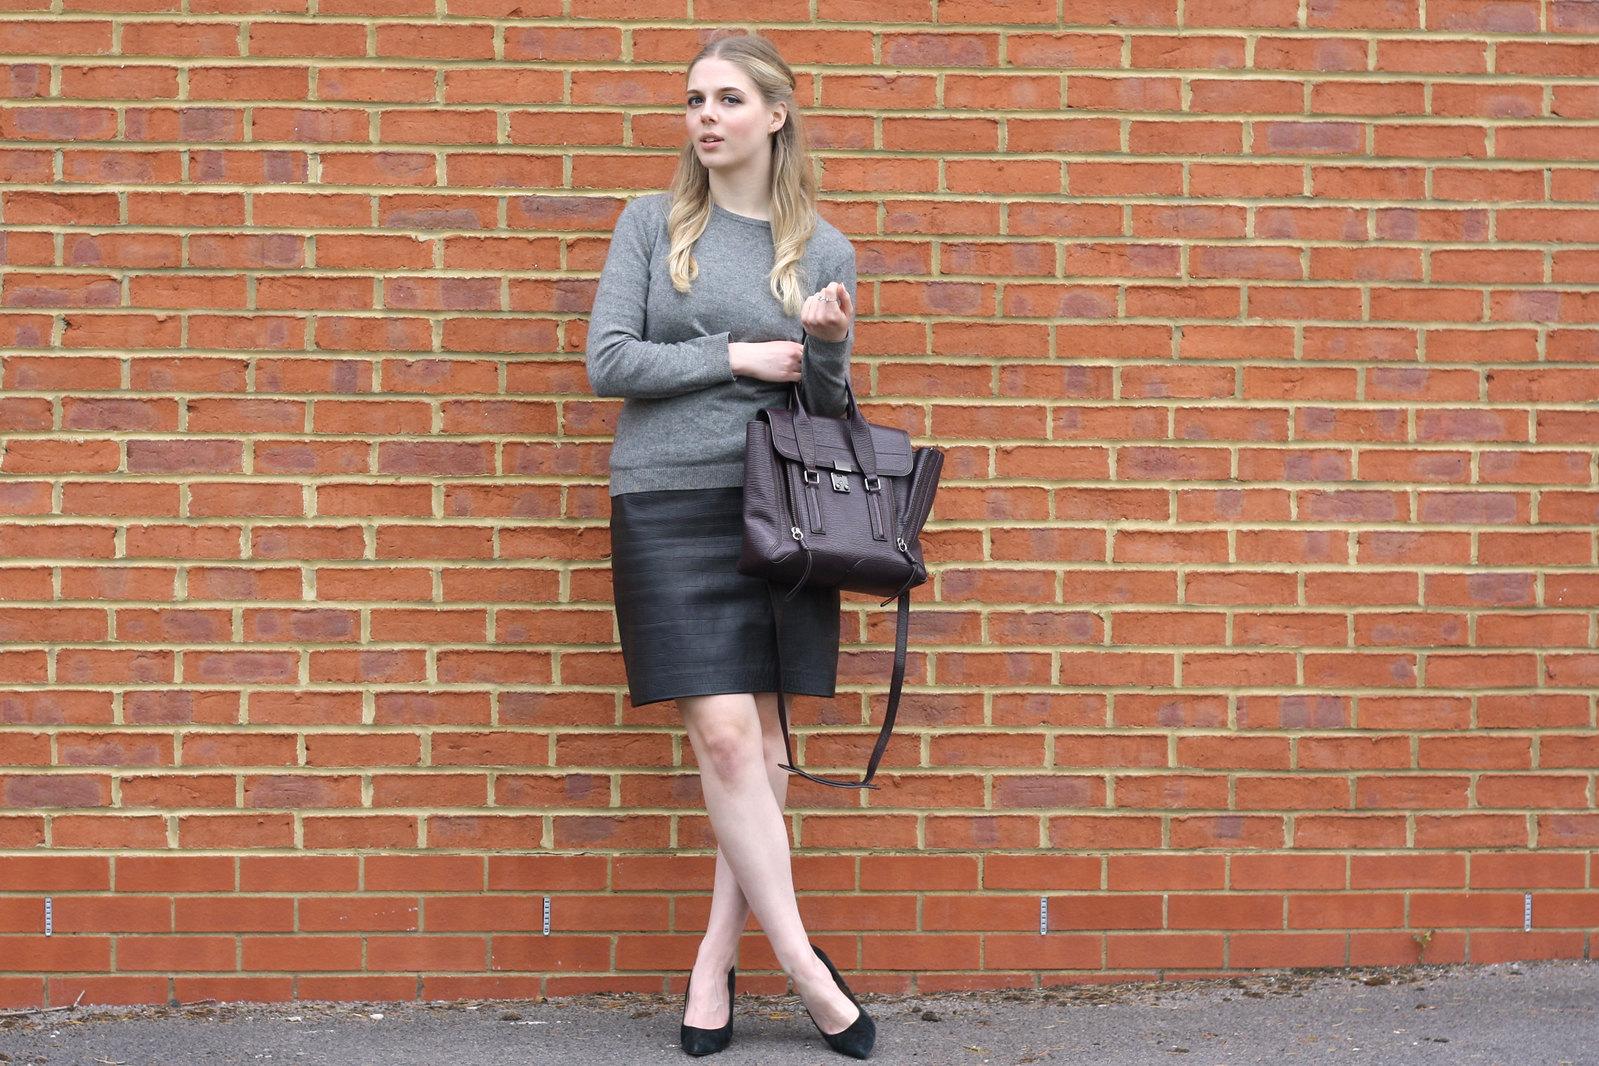 Topshop Boutique black leather skirt